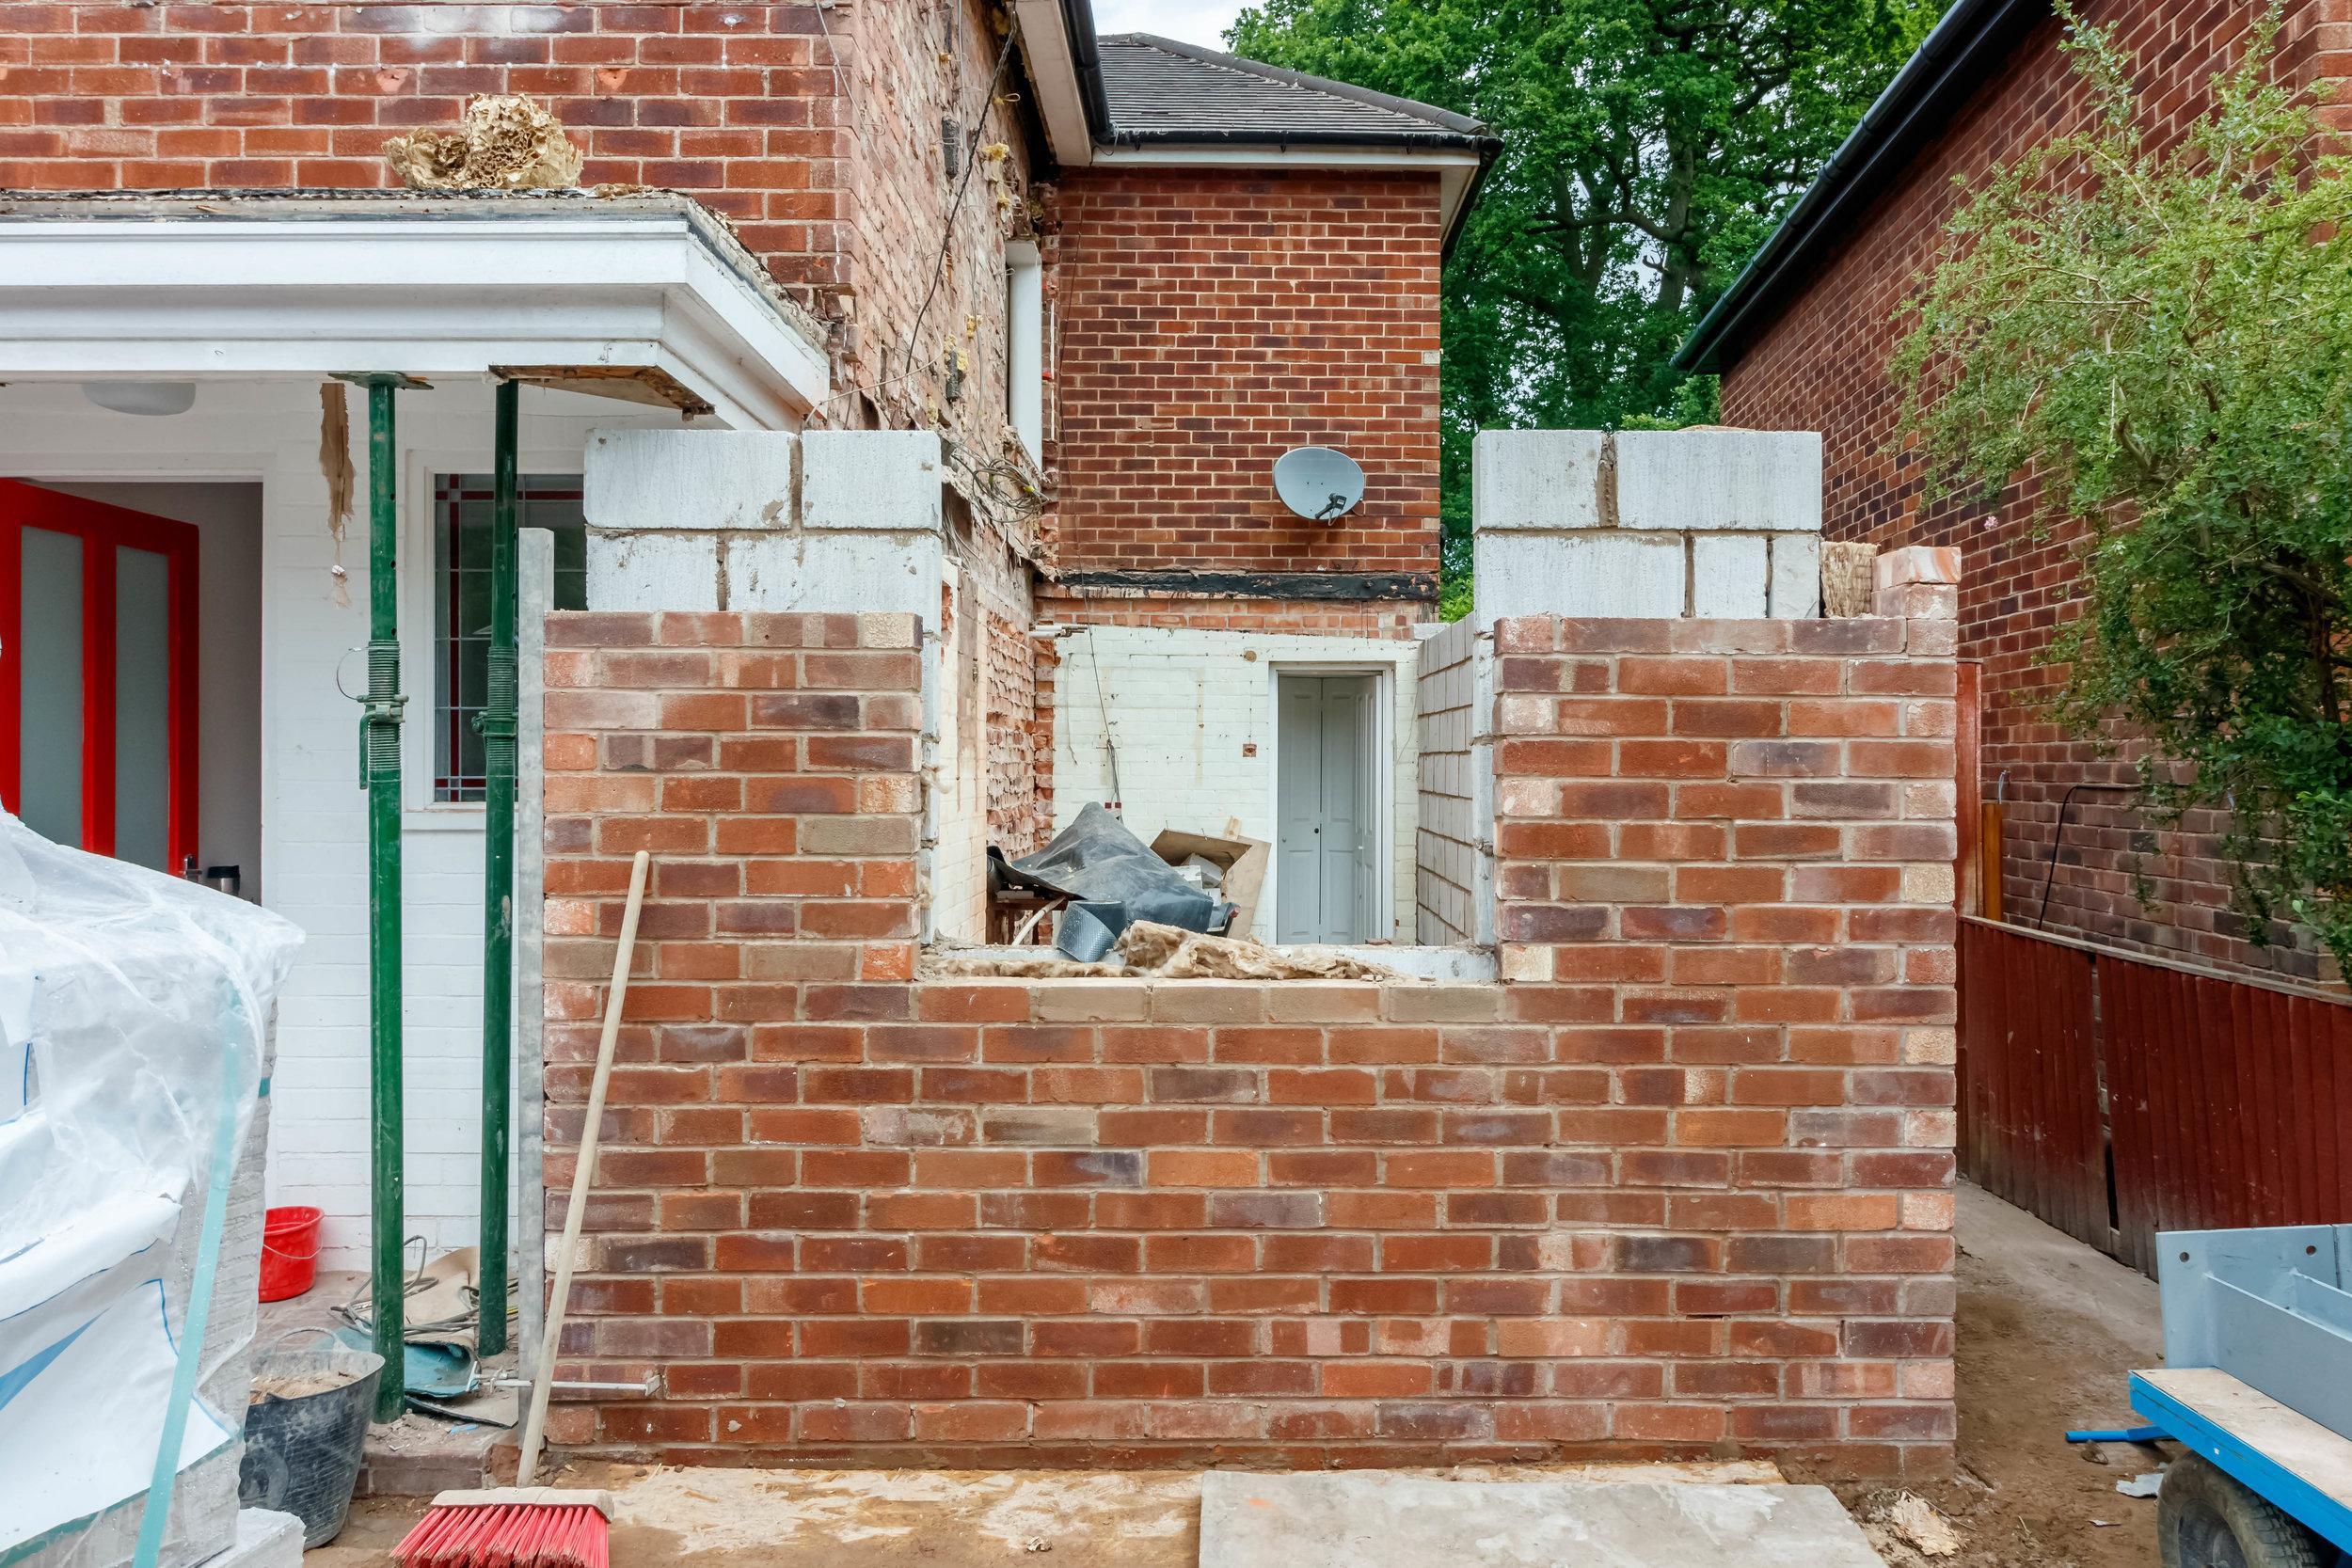 PropertyPhotographs-05021.jpg